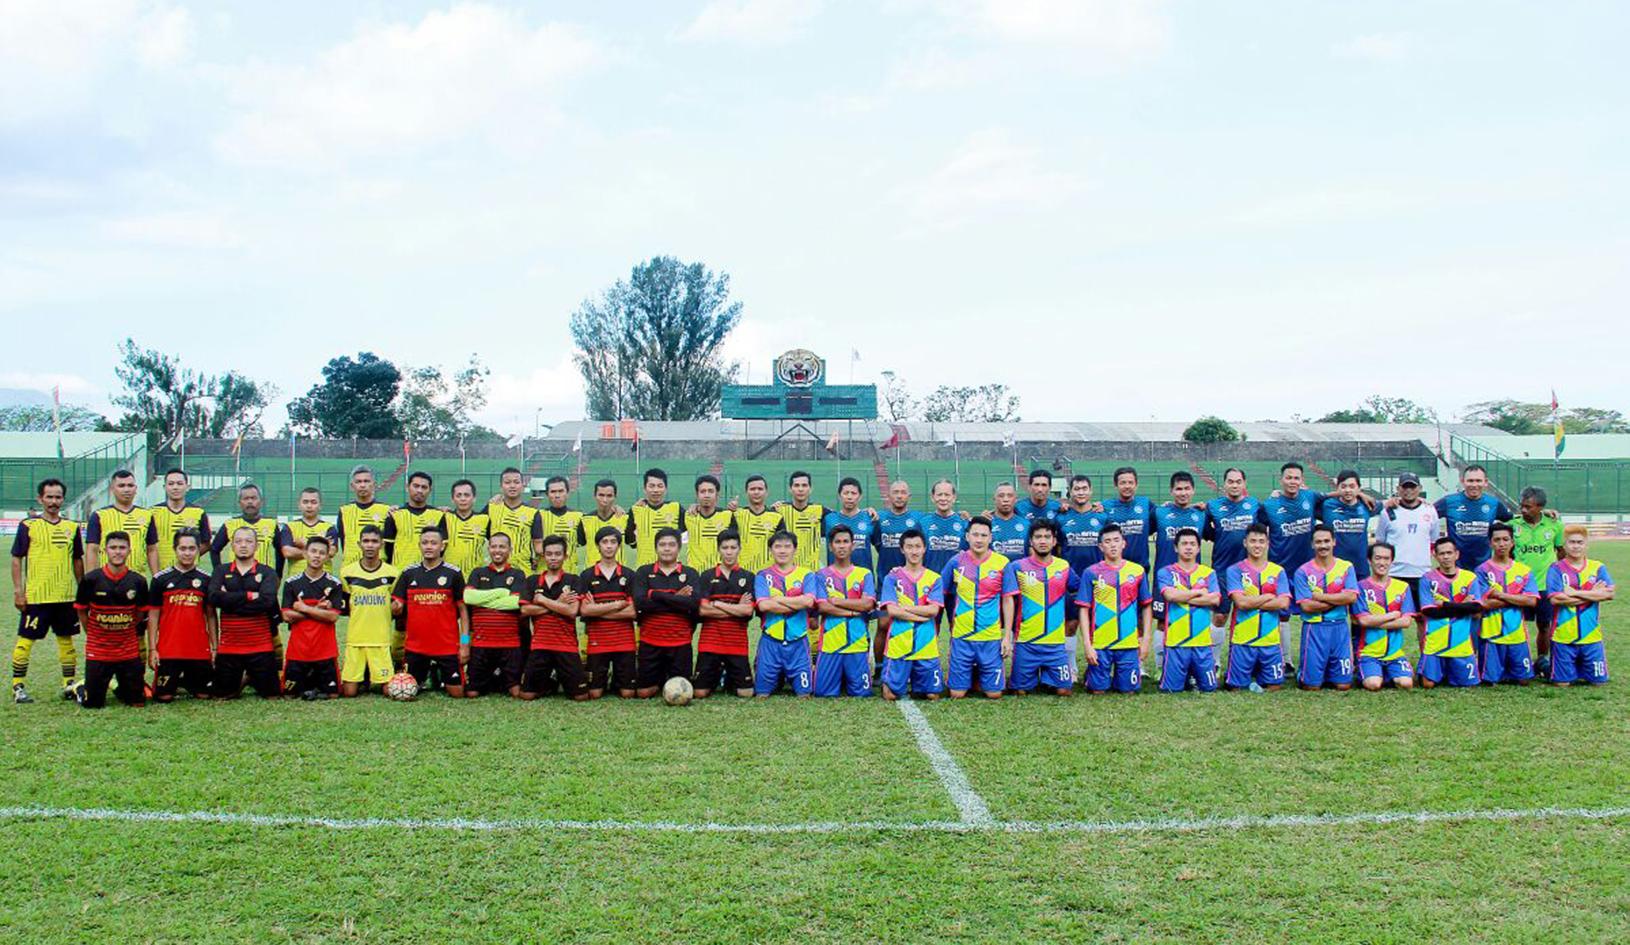 Pertandingan Persahabatan Stadion Siliwangi Pikiran Rakyat Tantan Bandung Kab